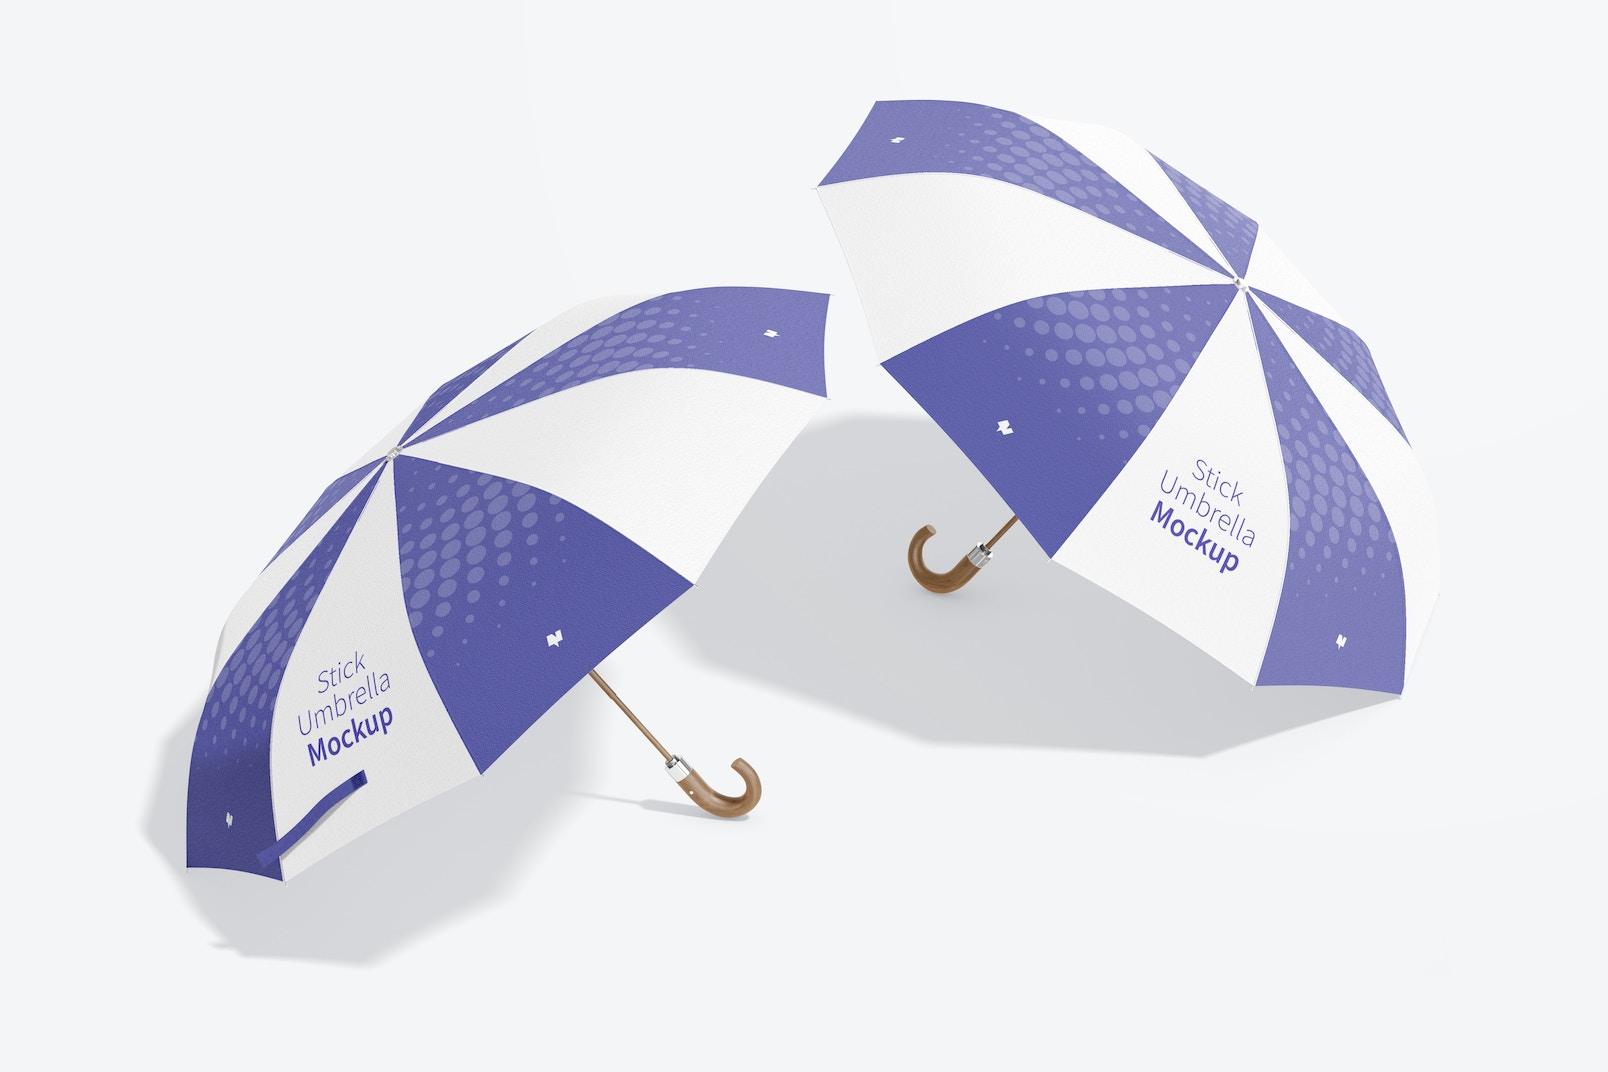 Stick Umbrellas Mockup